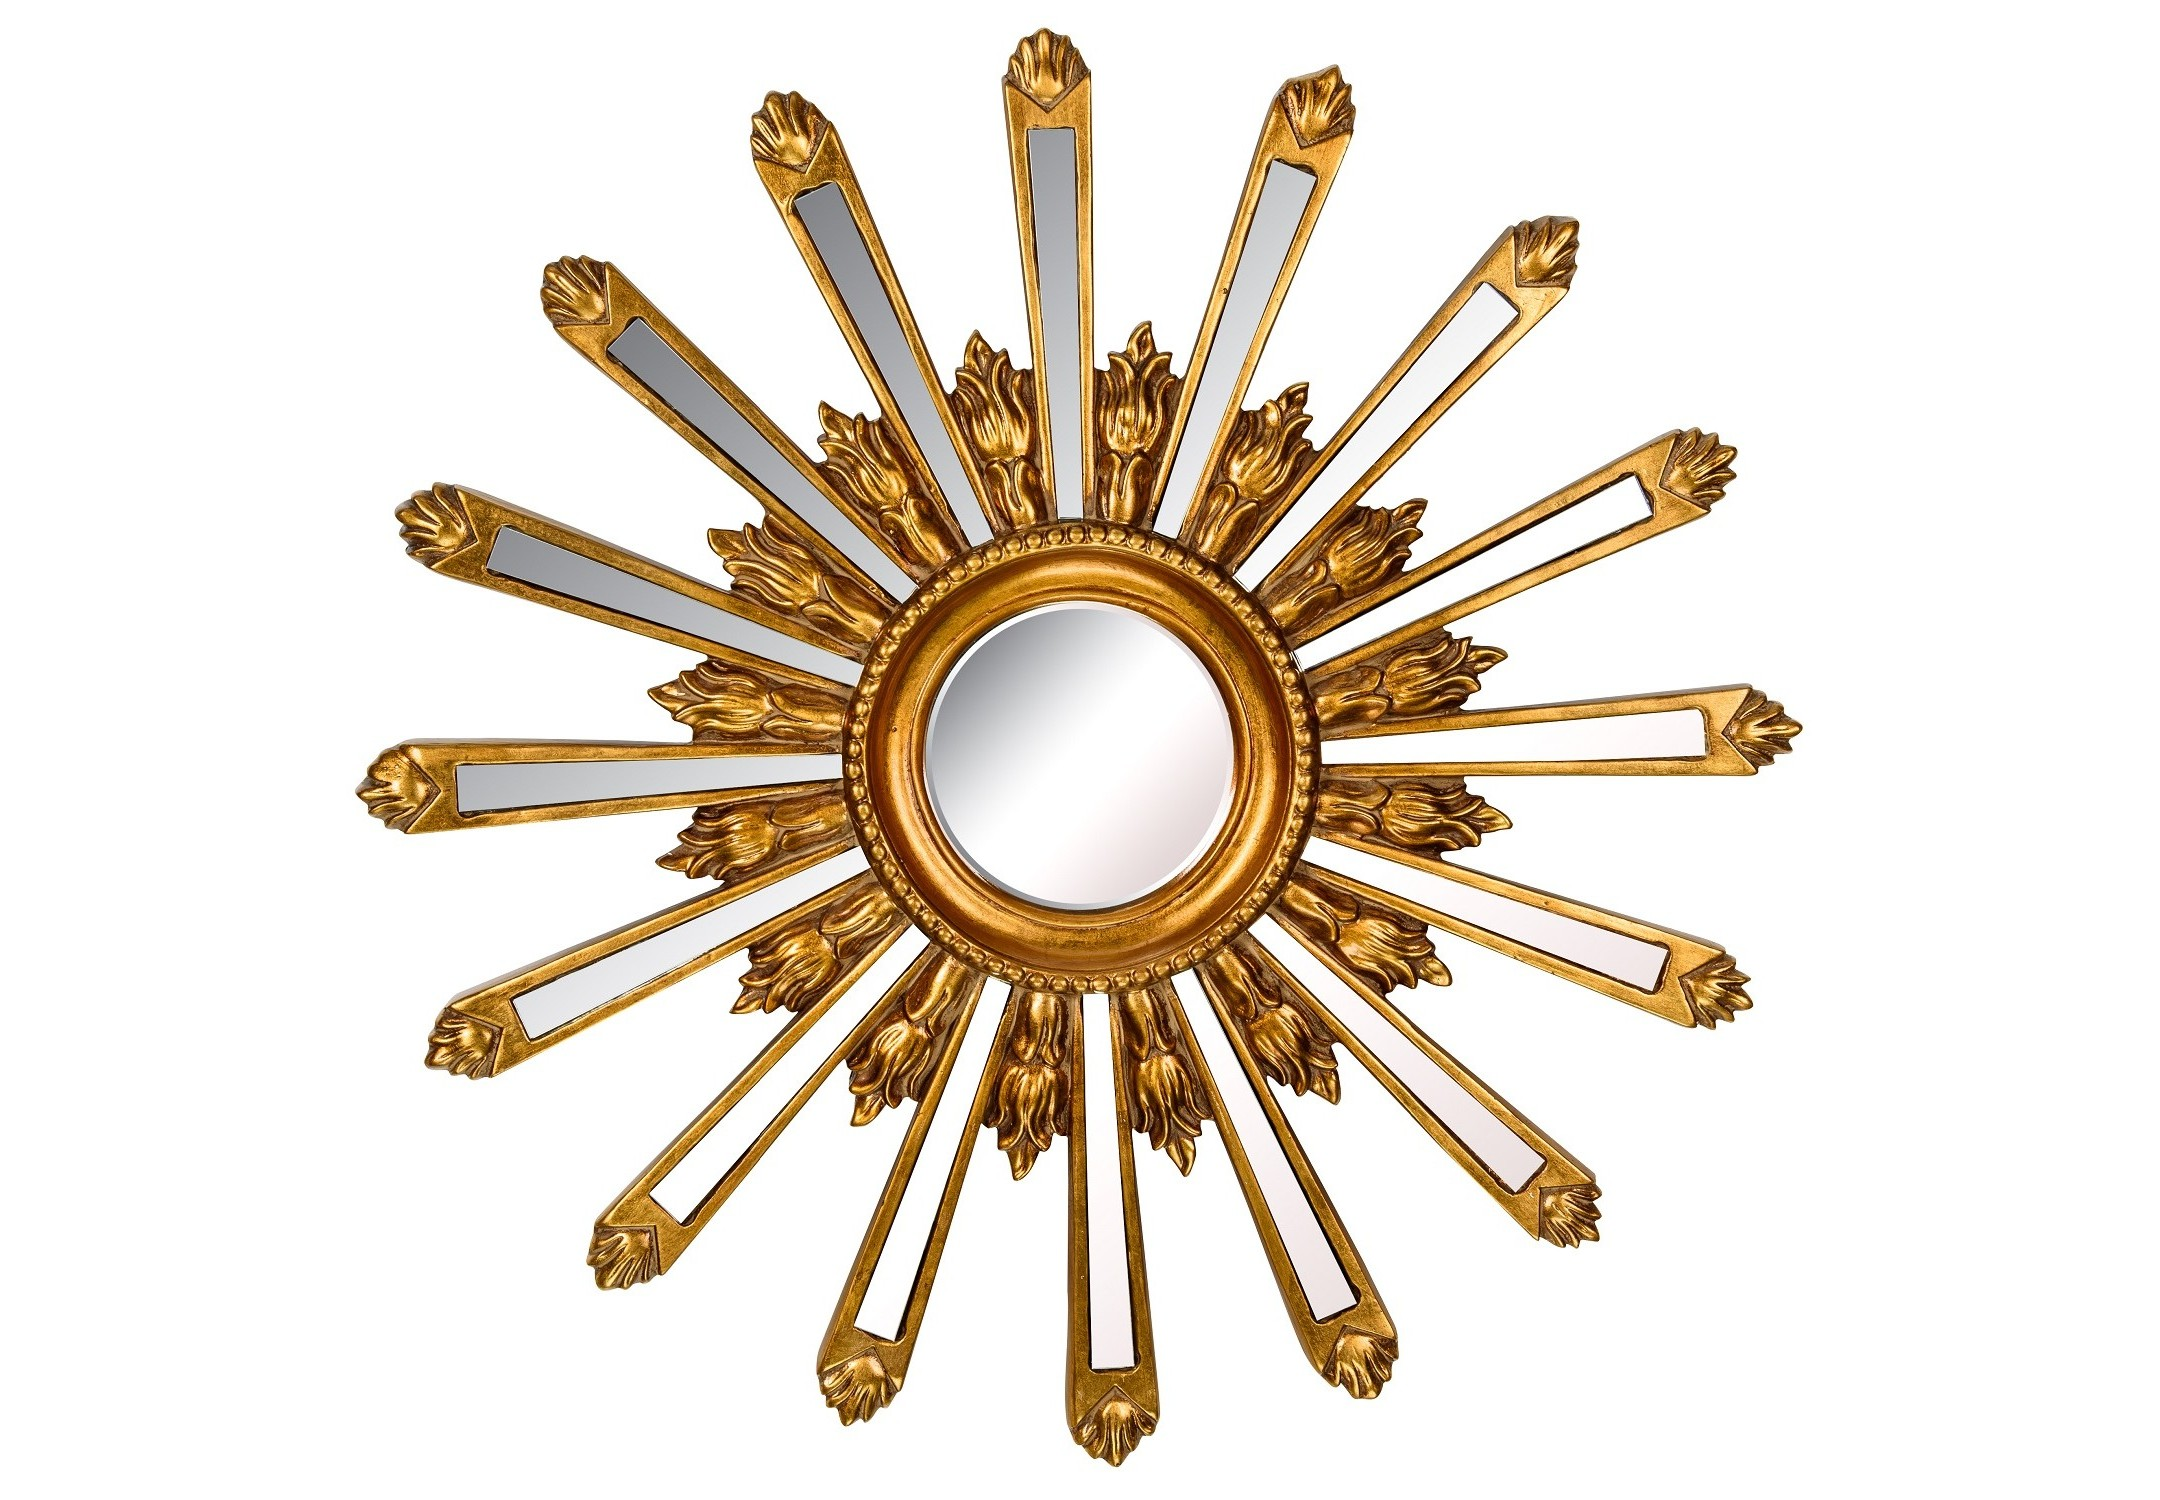 Зеркало Orion GoldНастенные зеркала<br><br><br>Material: Полирезин<br>Глубина см: 4.0